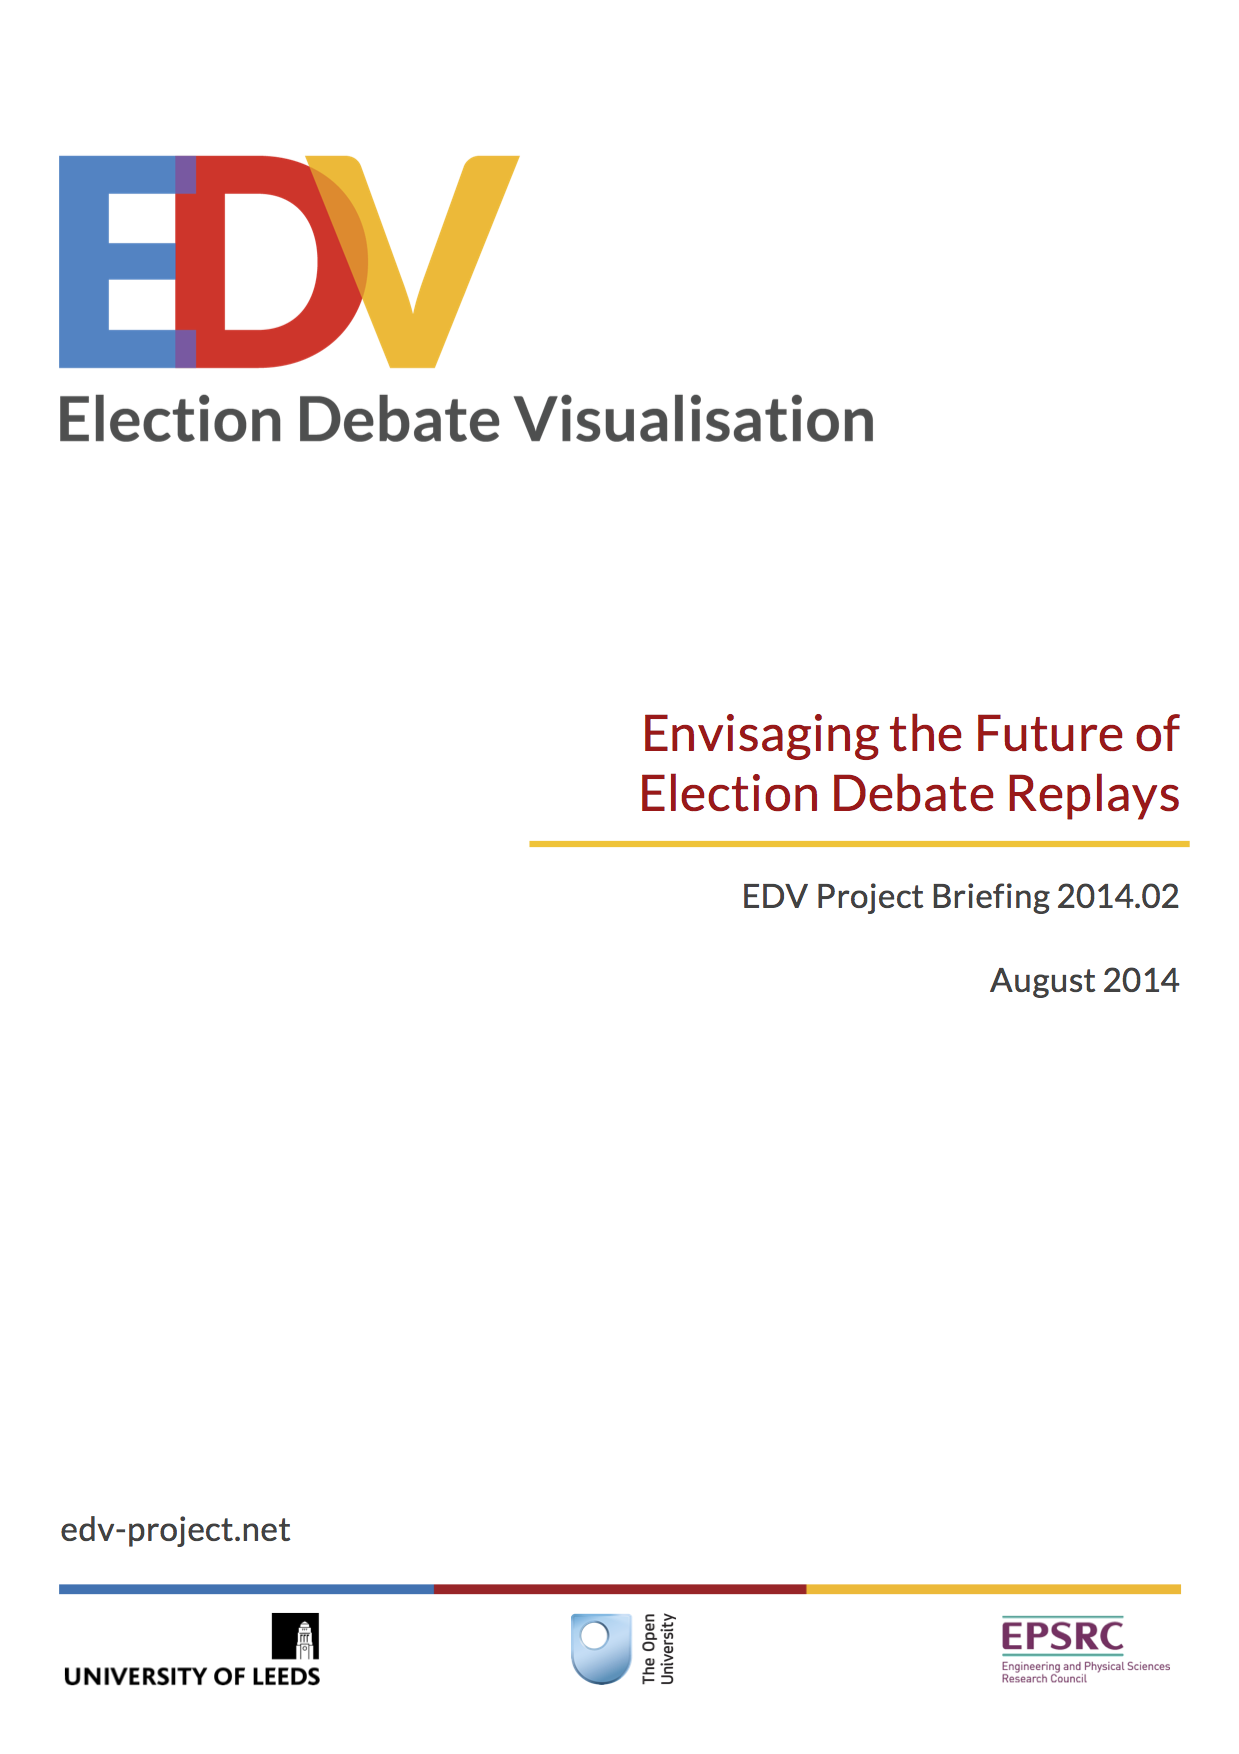 EDV briefing 2014.02